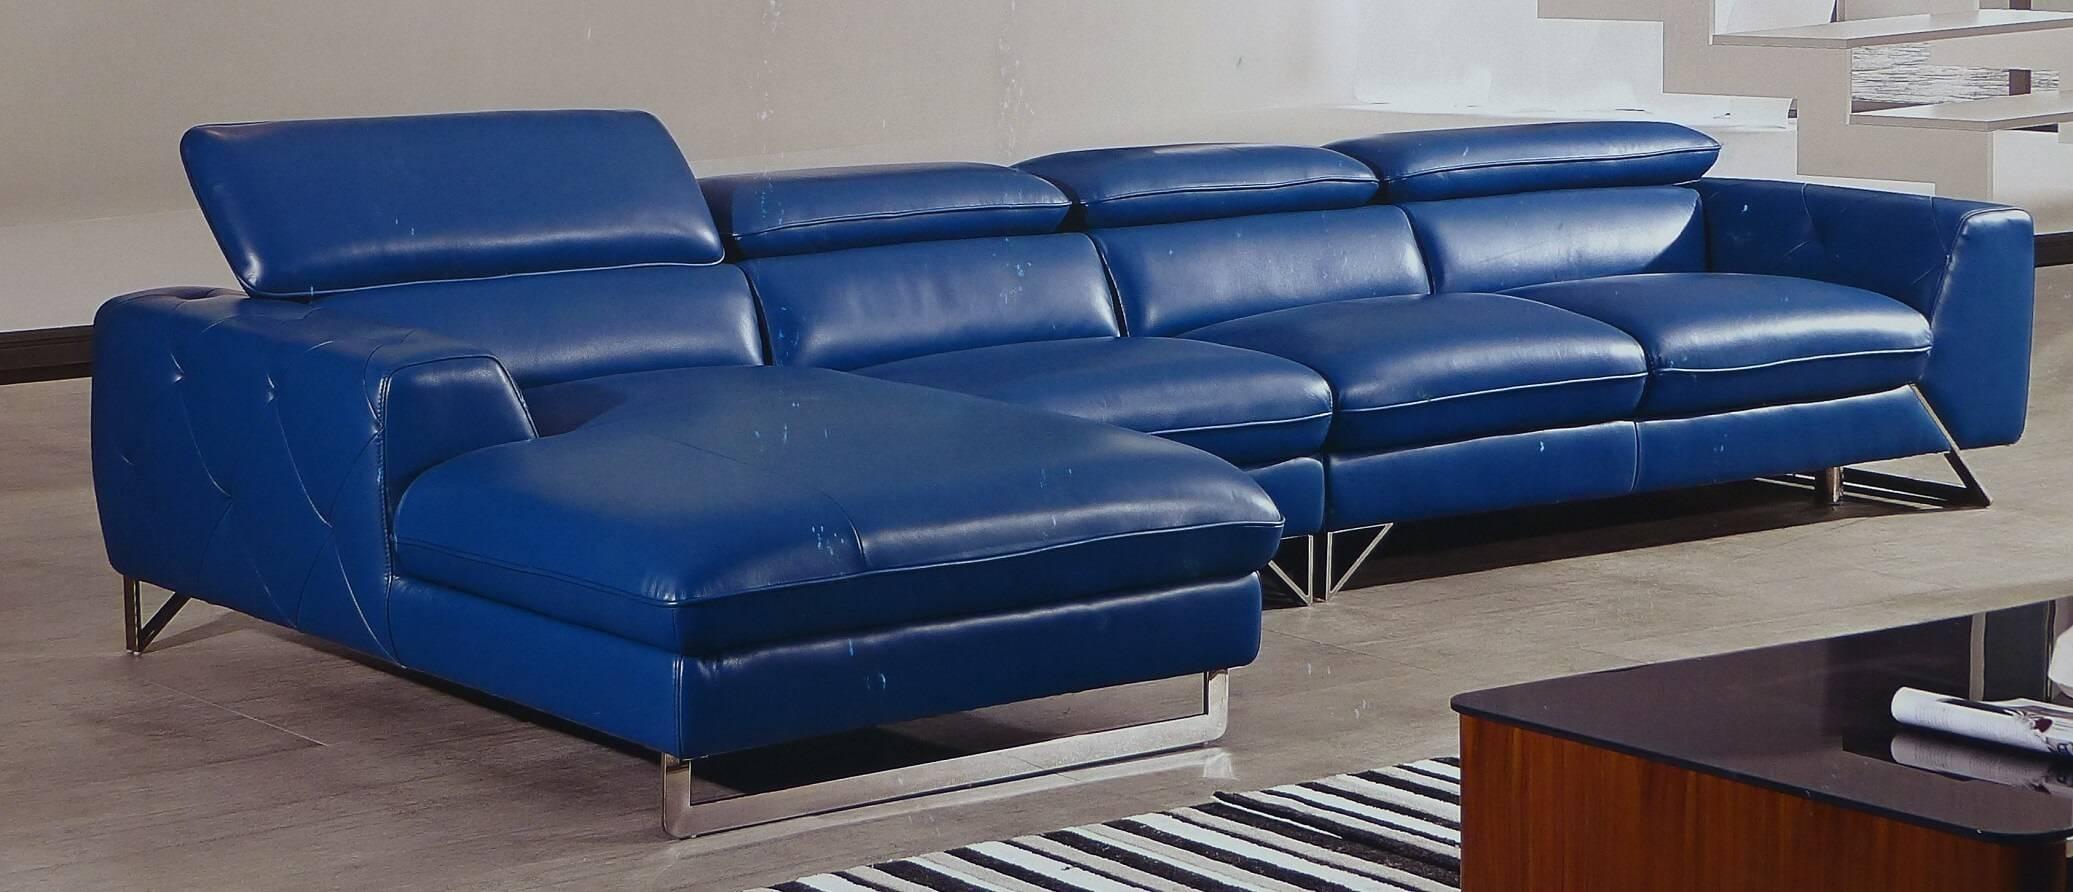 Kmart Sleeper Sofa 85 With Kmart Sleeper Sofa   Jinanhongyu Within Kmart  Sleeper Sofas (Image